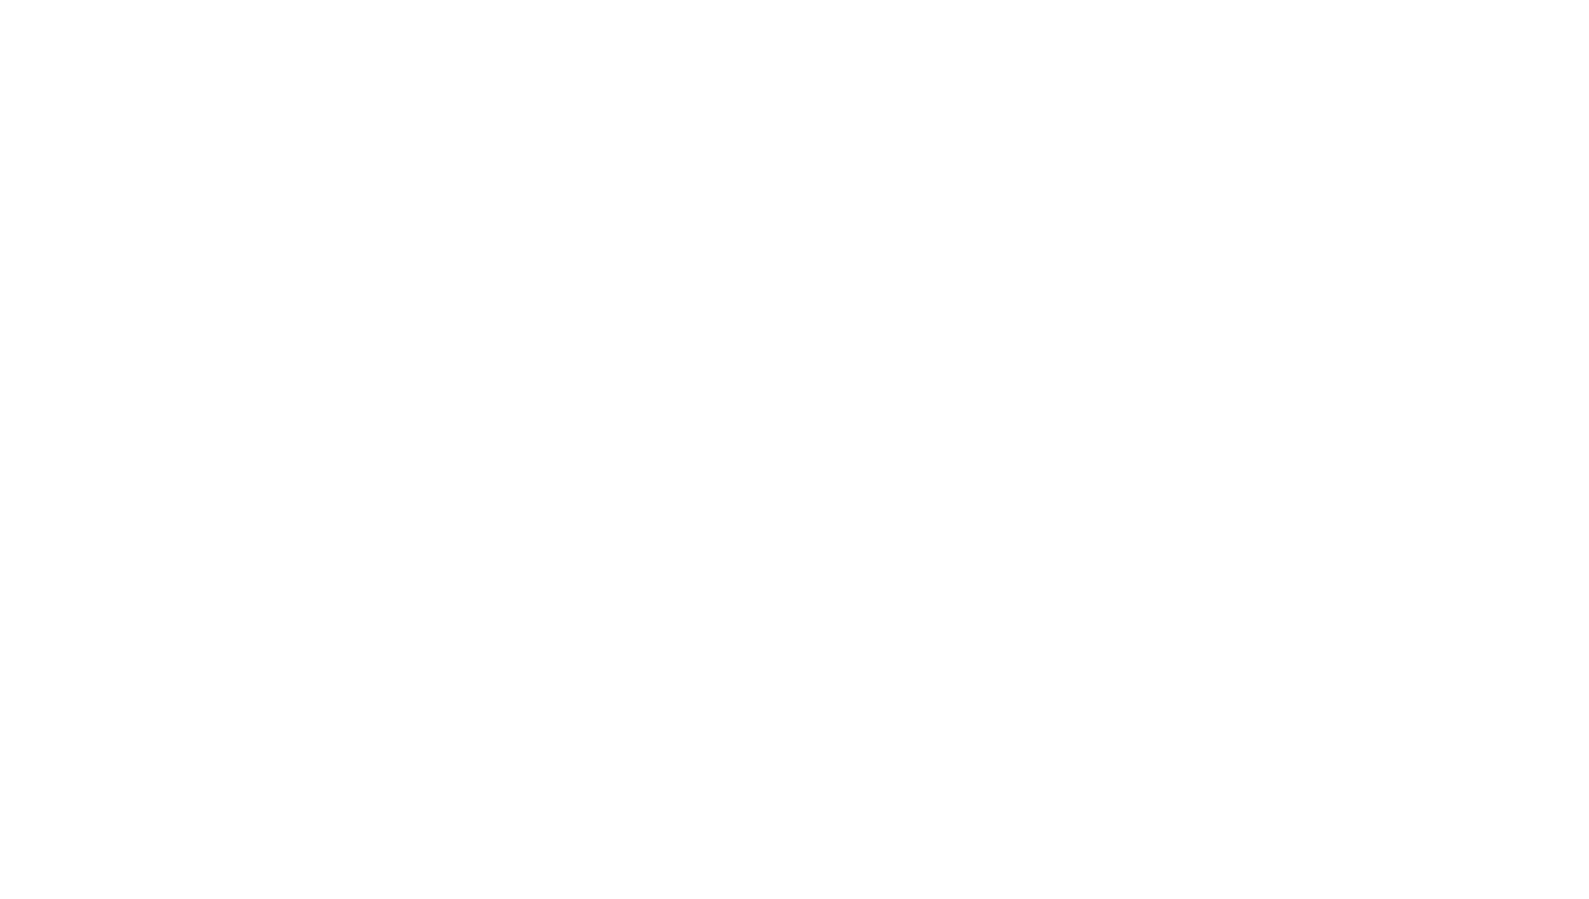 Alpa Aluminyum San.Tic. Ömer AKKAŞ